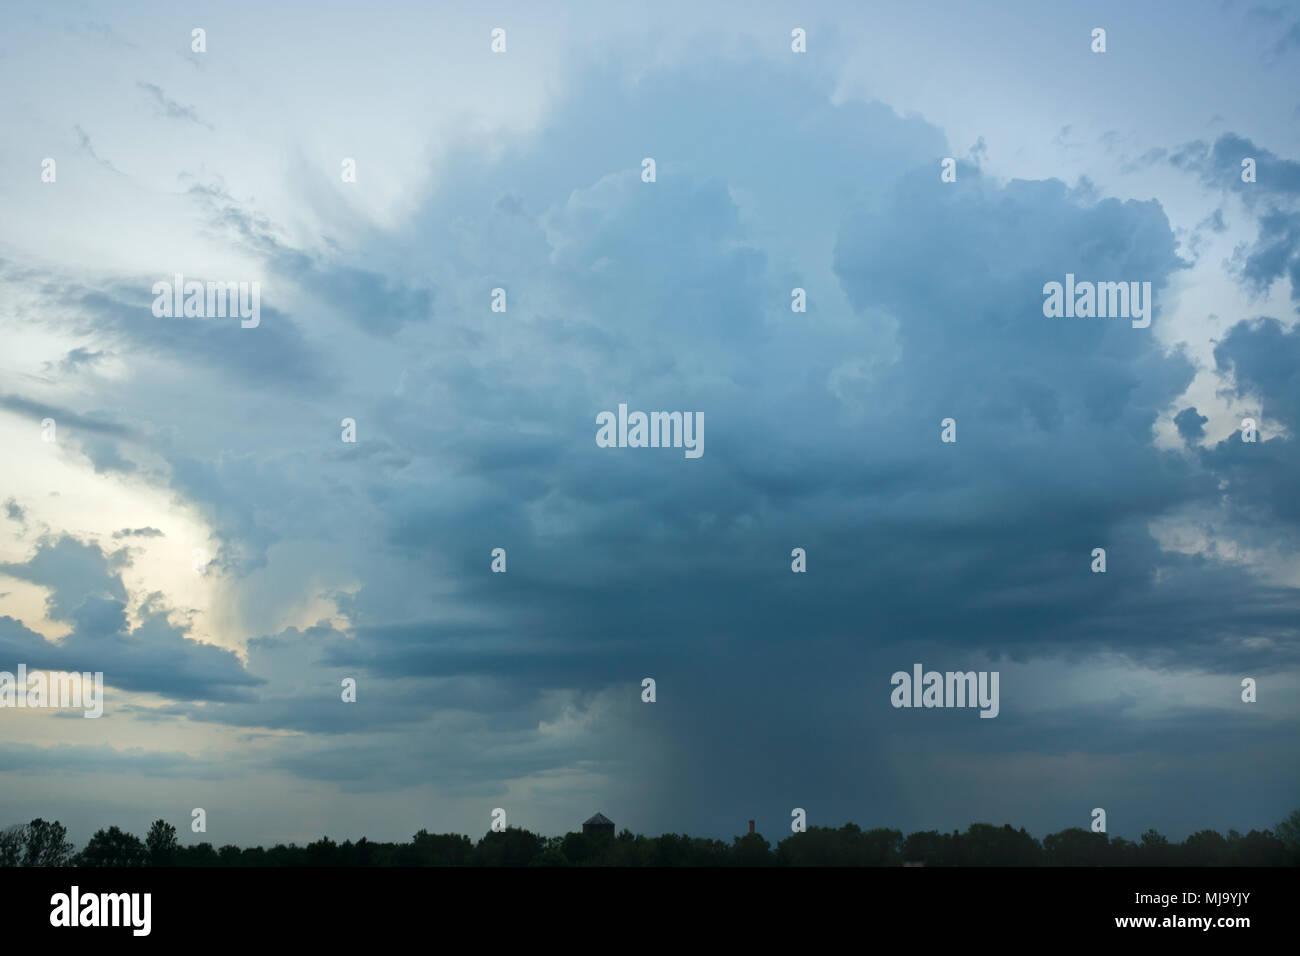 A beautiful storm cloud, rained by rain. - Stock Image